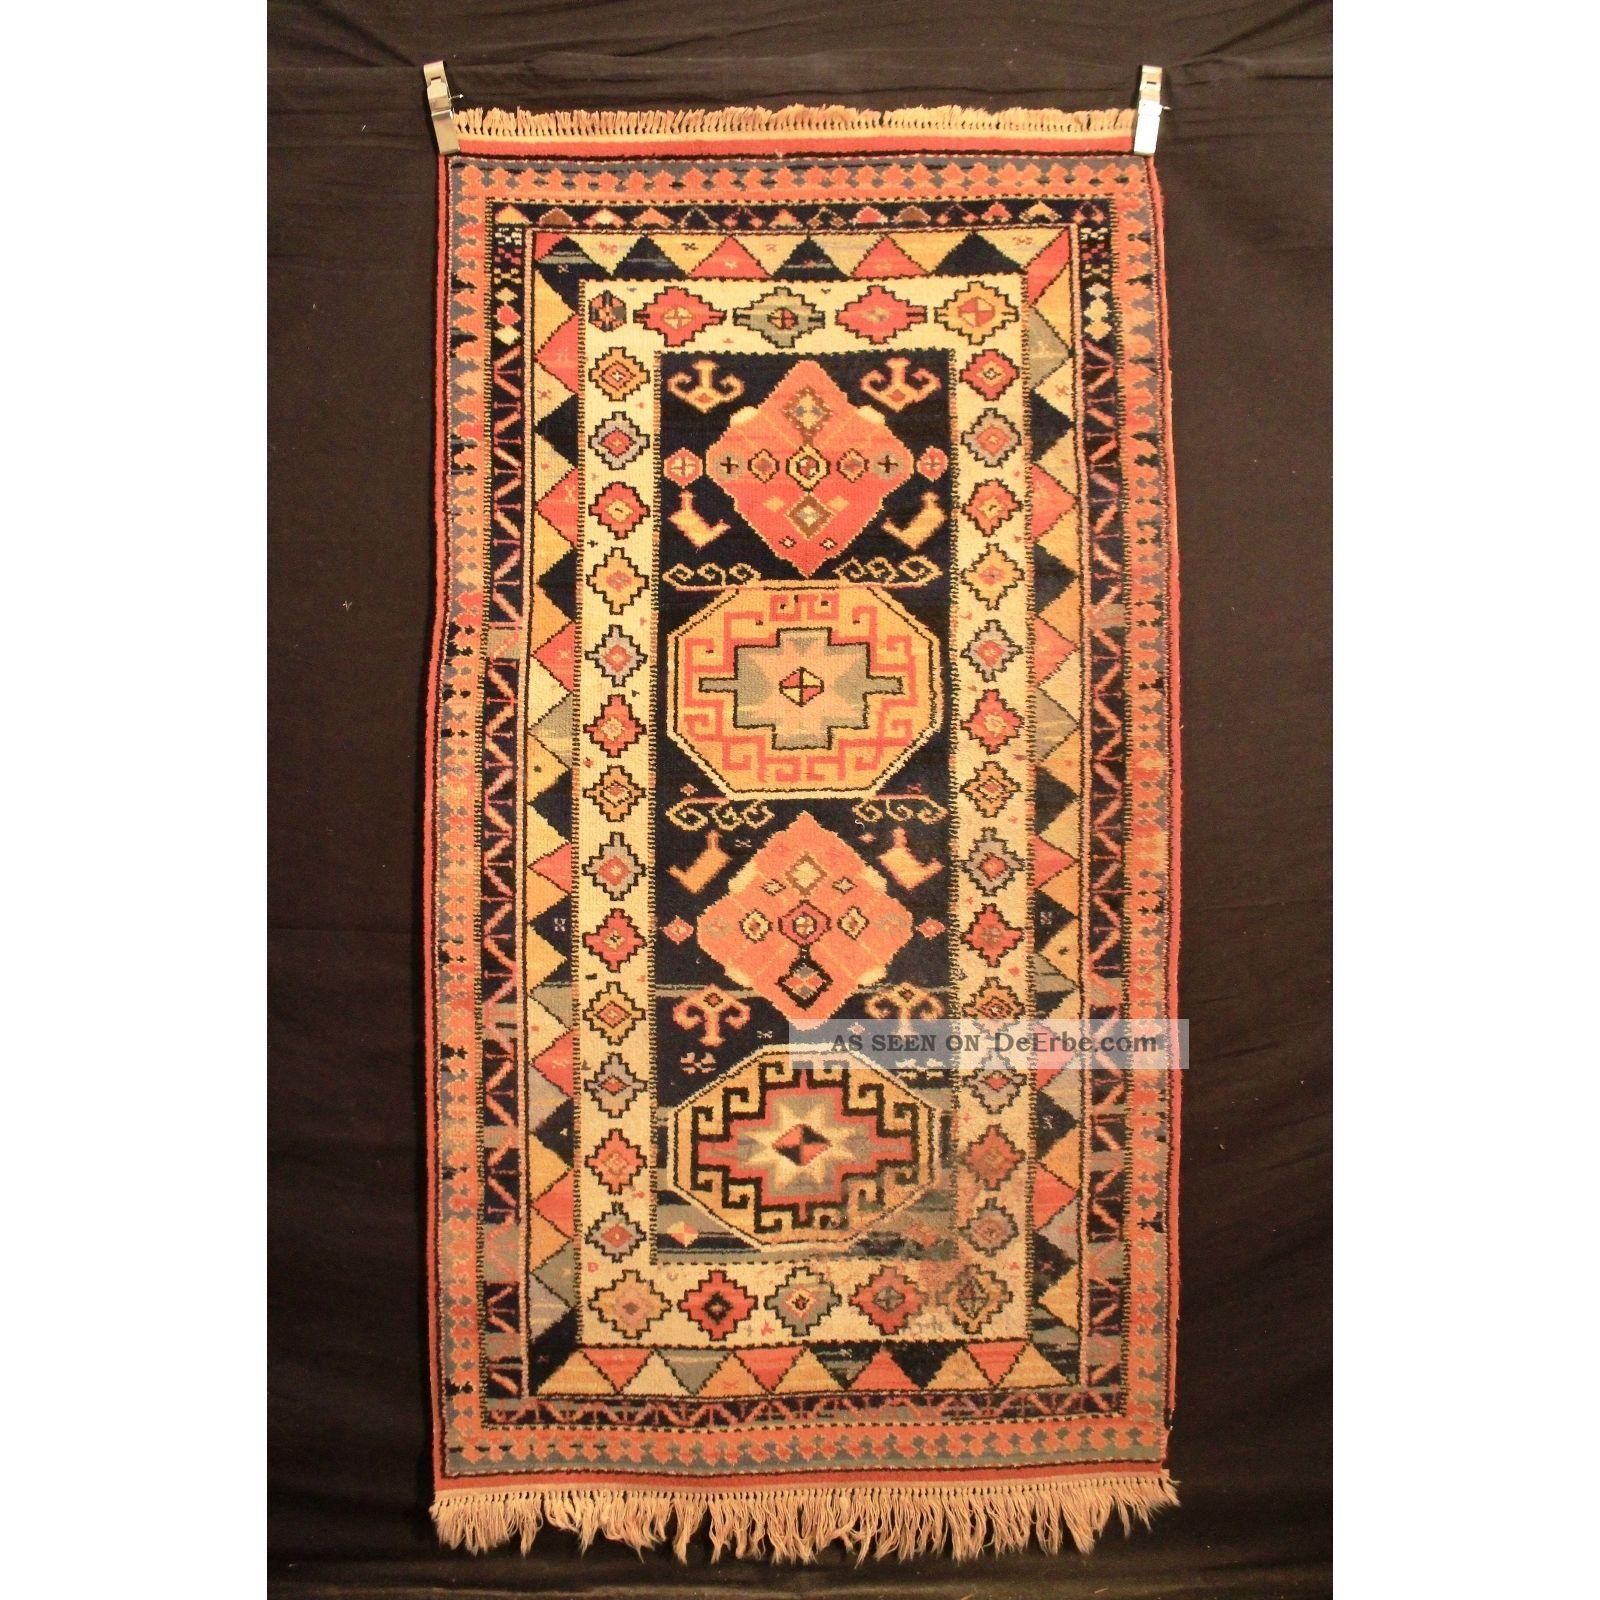 Alter Gewebter Orient Teppich Kazak Heriz Carpet Old Rug Tappeto Tapis 200x110cm Teppiche & Flachgewebe Bild